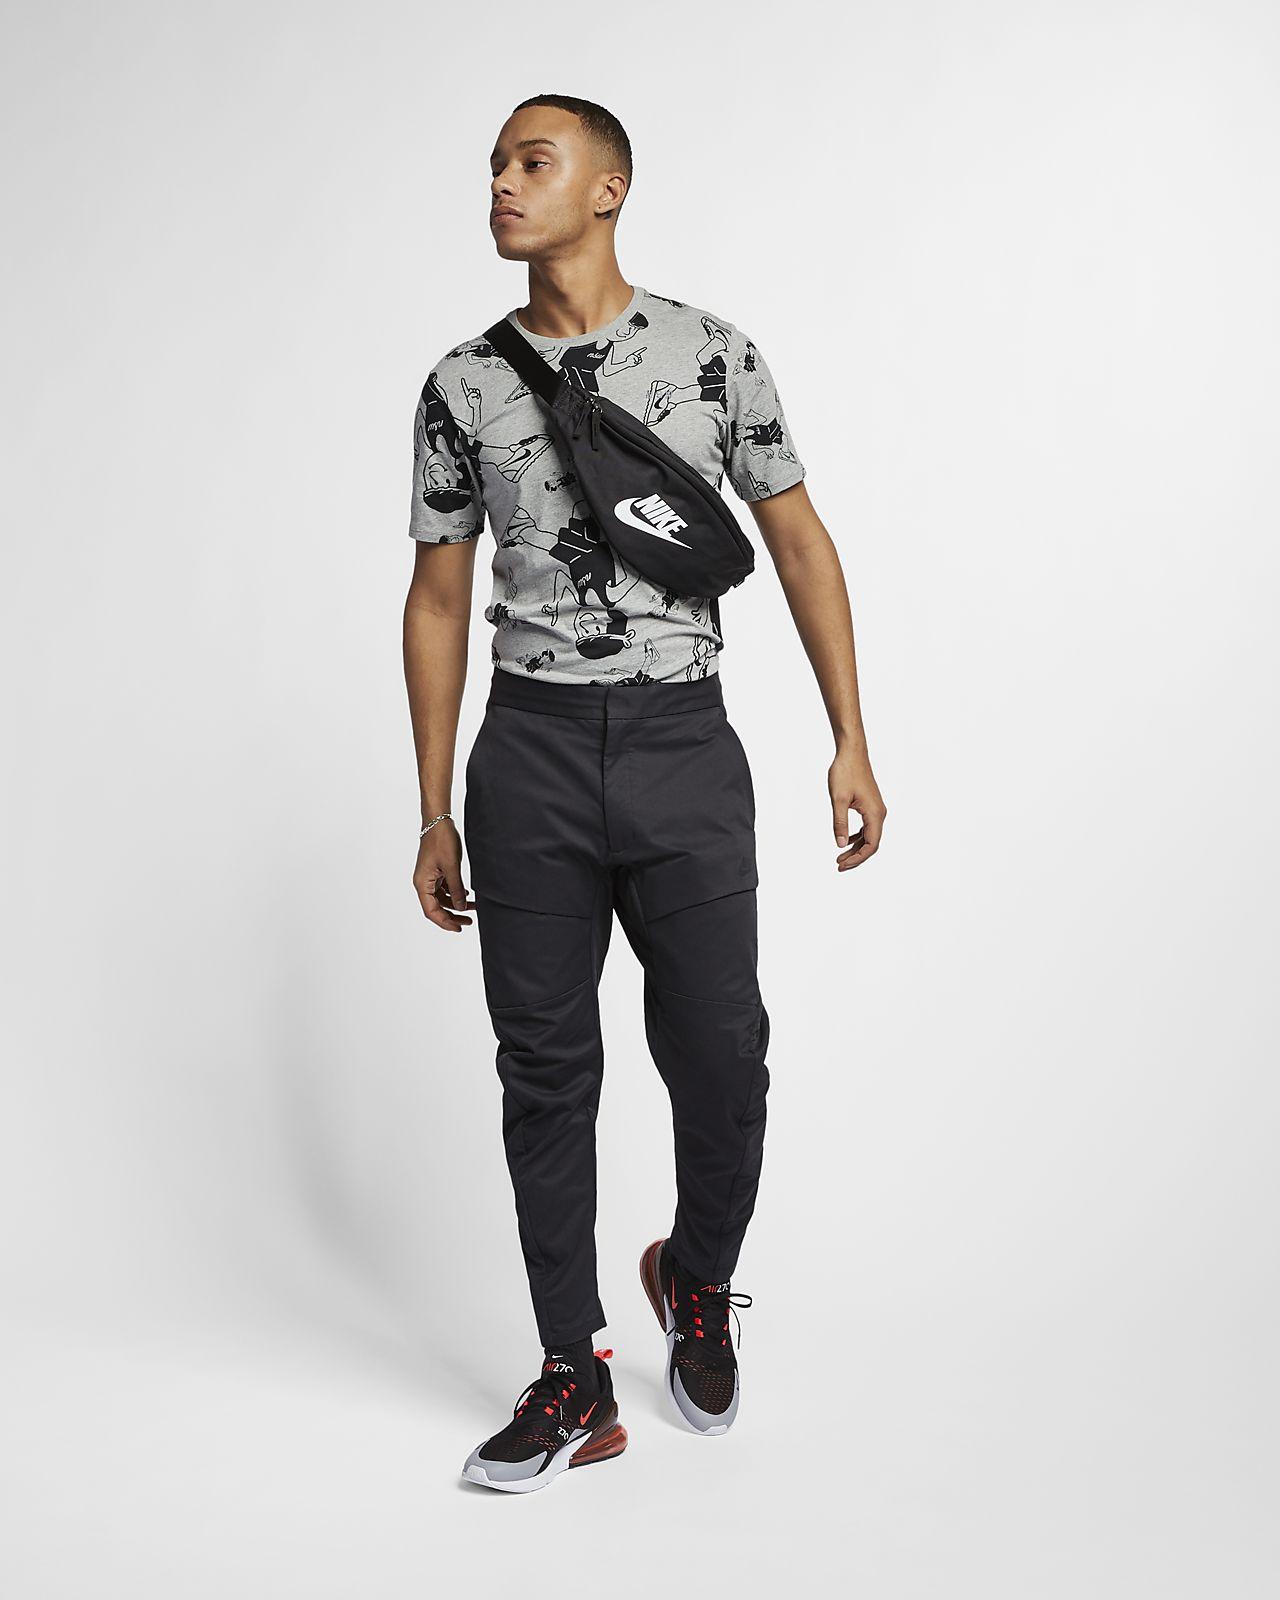 addf1c234d265 Pantalon cargo tissé Nike Sportswear Tech Pack pour Homme. Nike.com CA